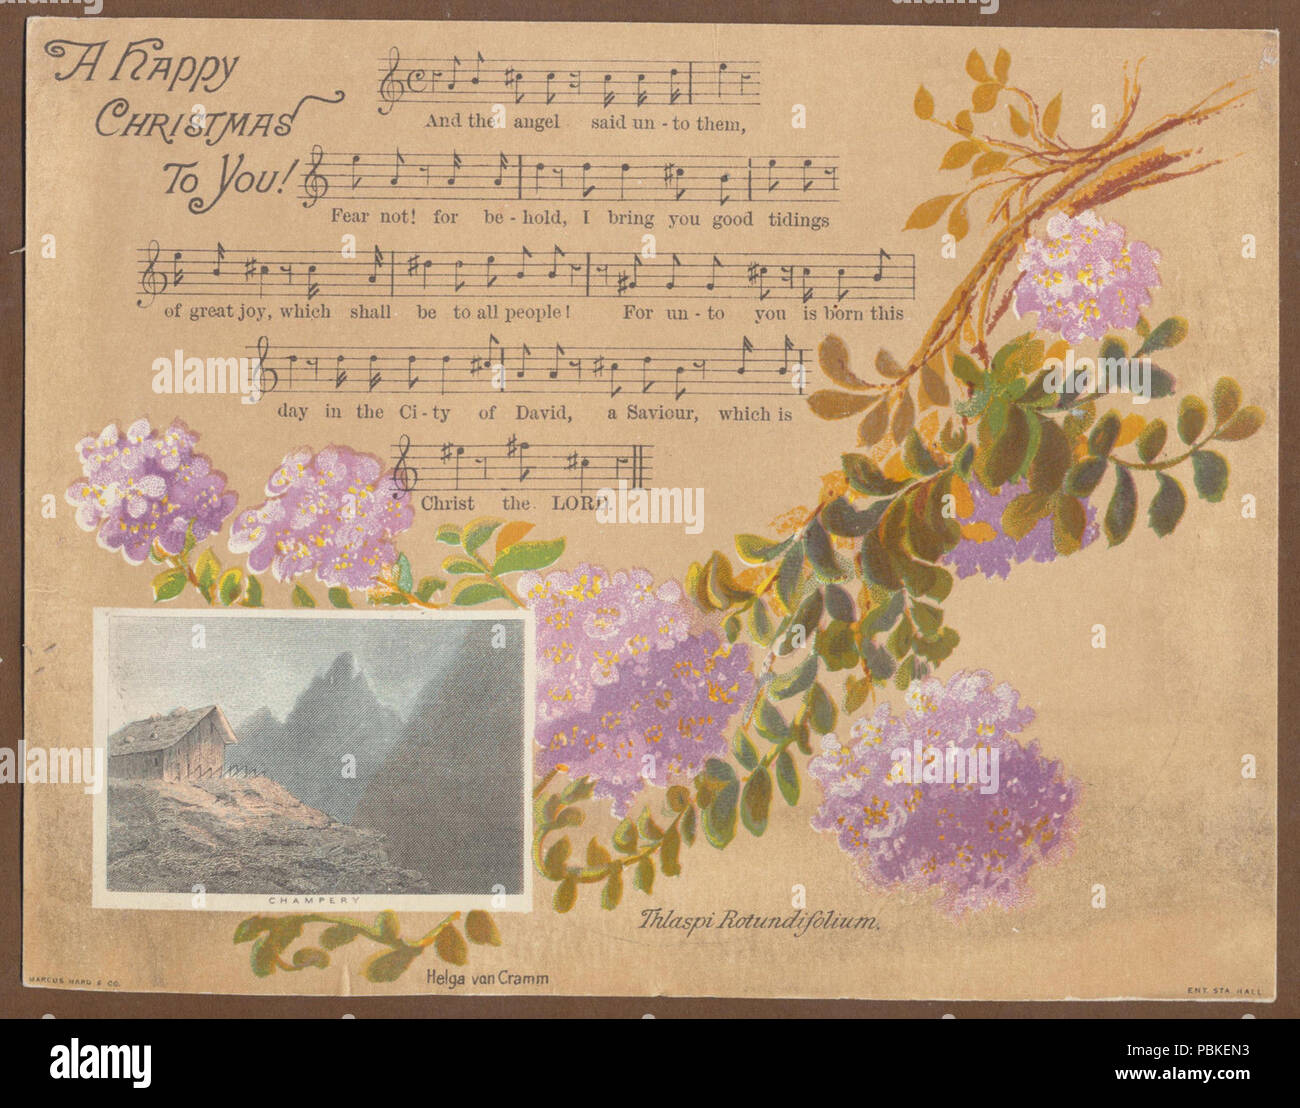 751 Helga von Cramm, Thlaspi Rotundifolium, published by Marcus Ward & Co., Champery. Chromolithographic Christmas card. Higher res - Stock Image